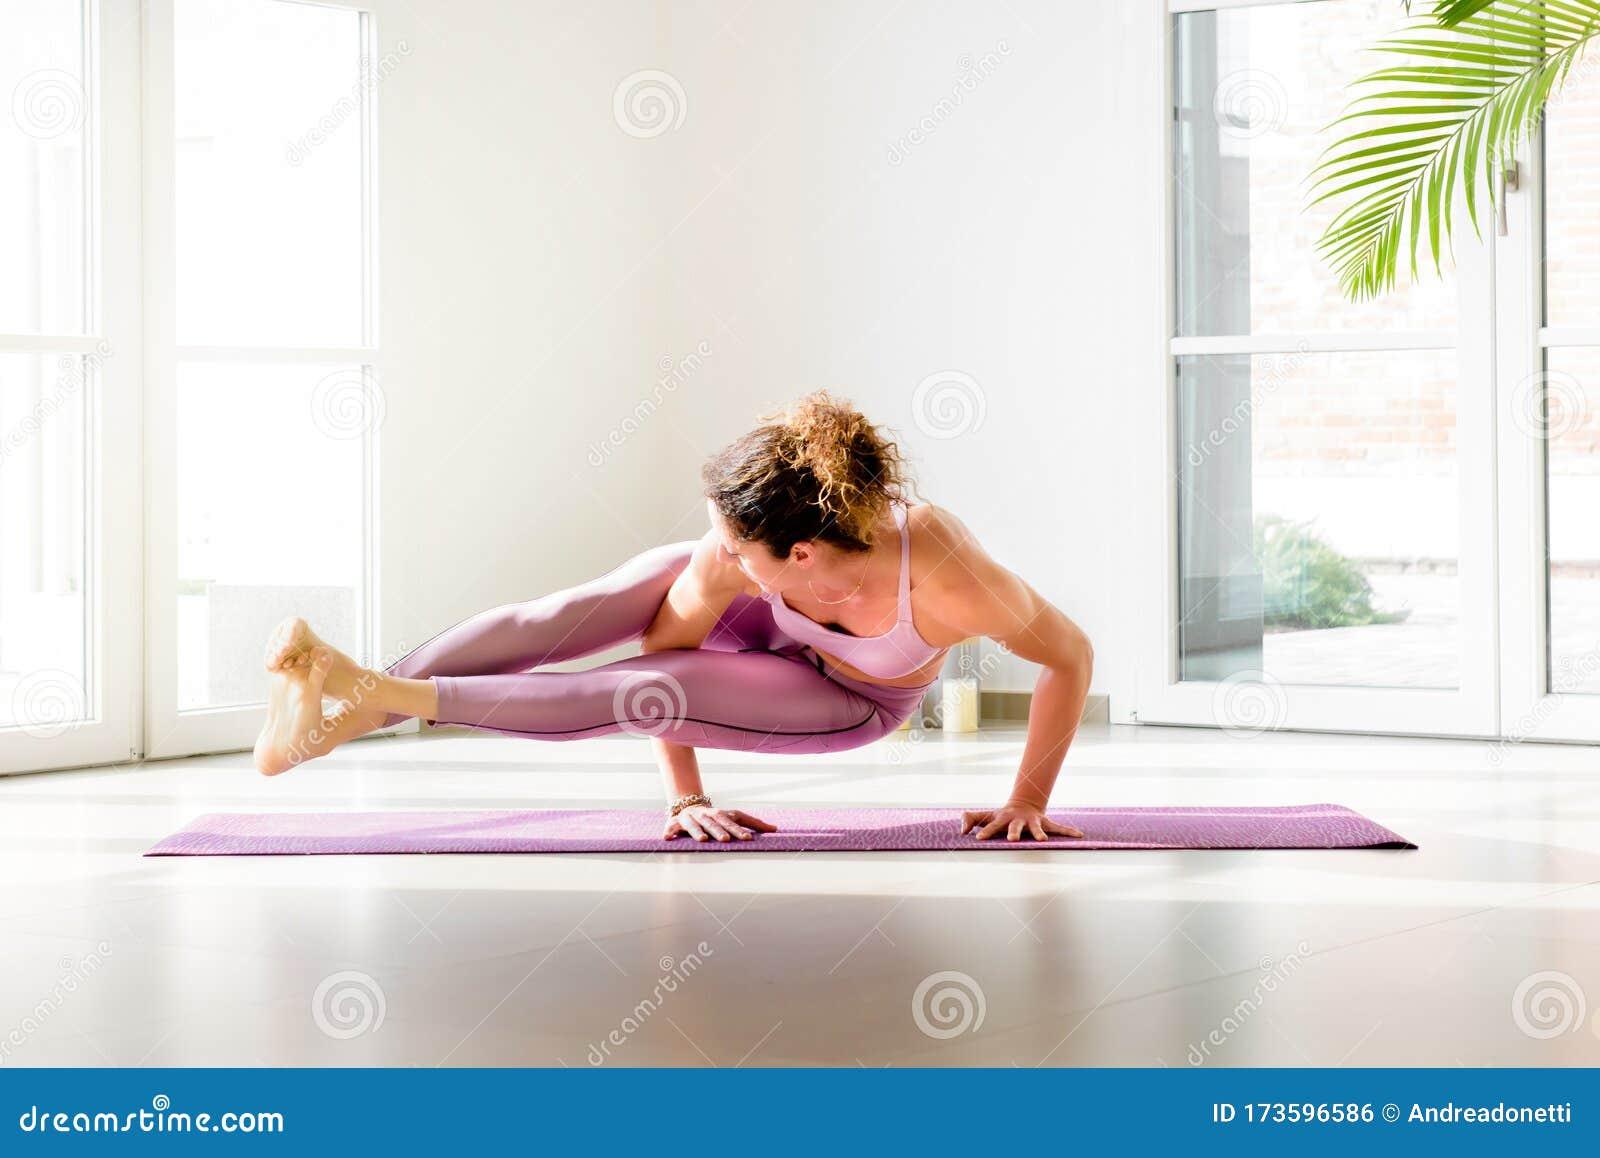 50,6504 Arm Balance Yoga Photos   Free & Royalty Free Stock Photos ...